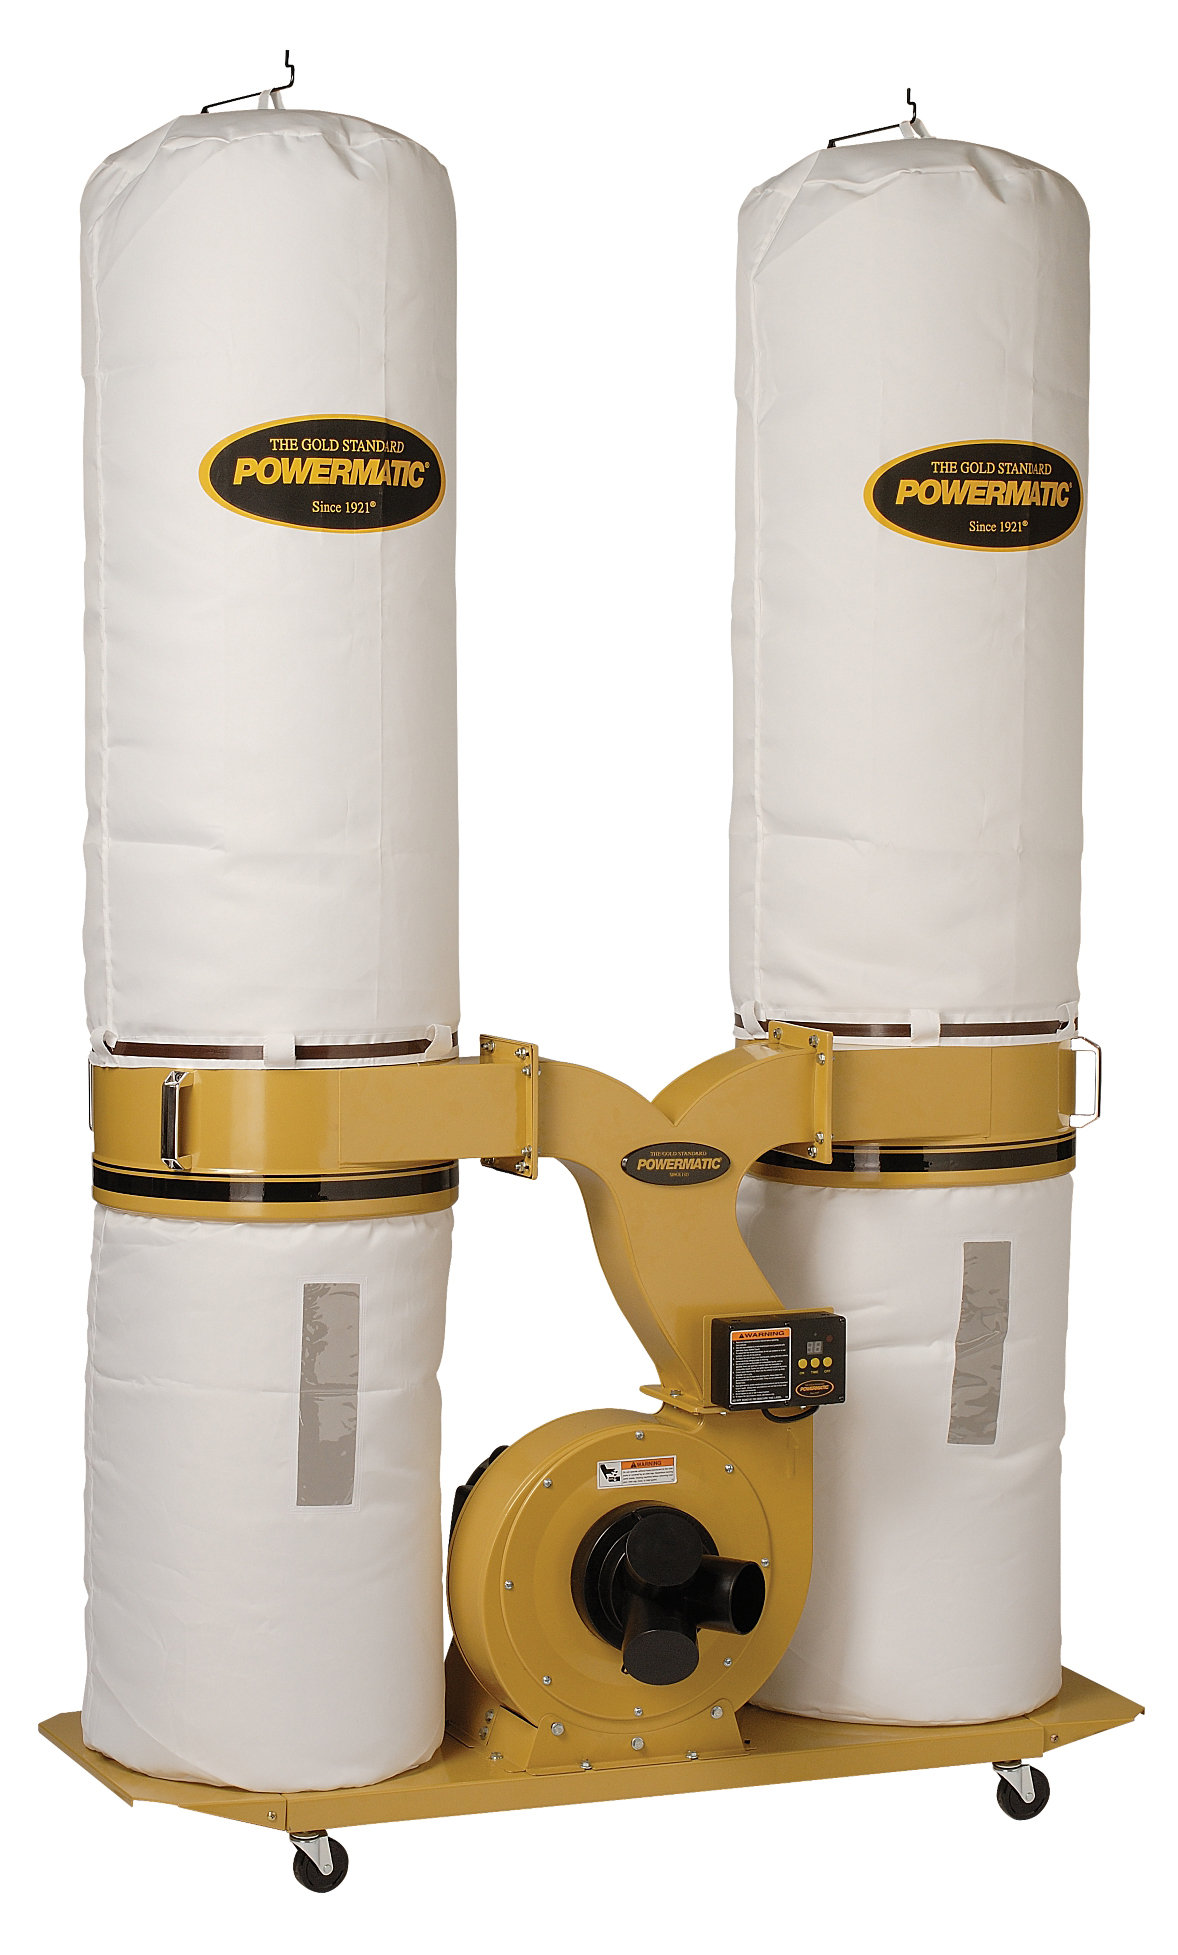 Powermatic PM1900TX-BK3 Dust Collector 3HP 3PH 230/460-Volt 30